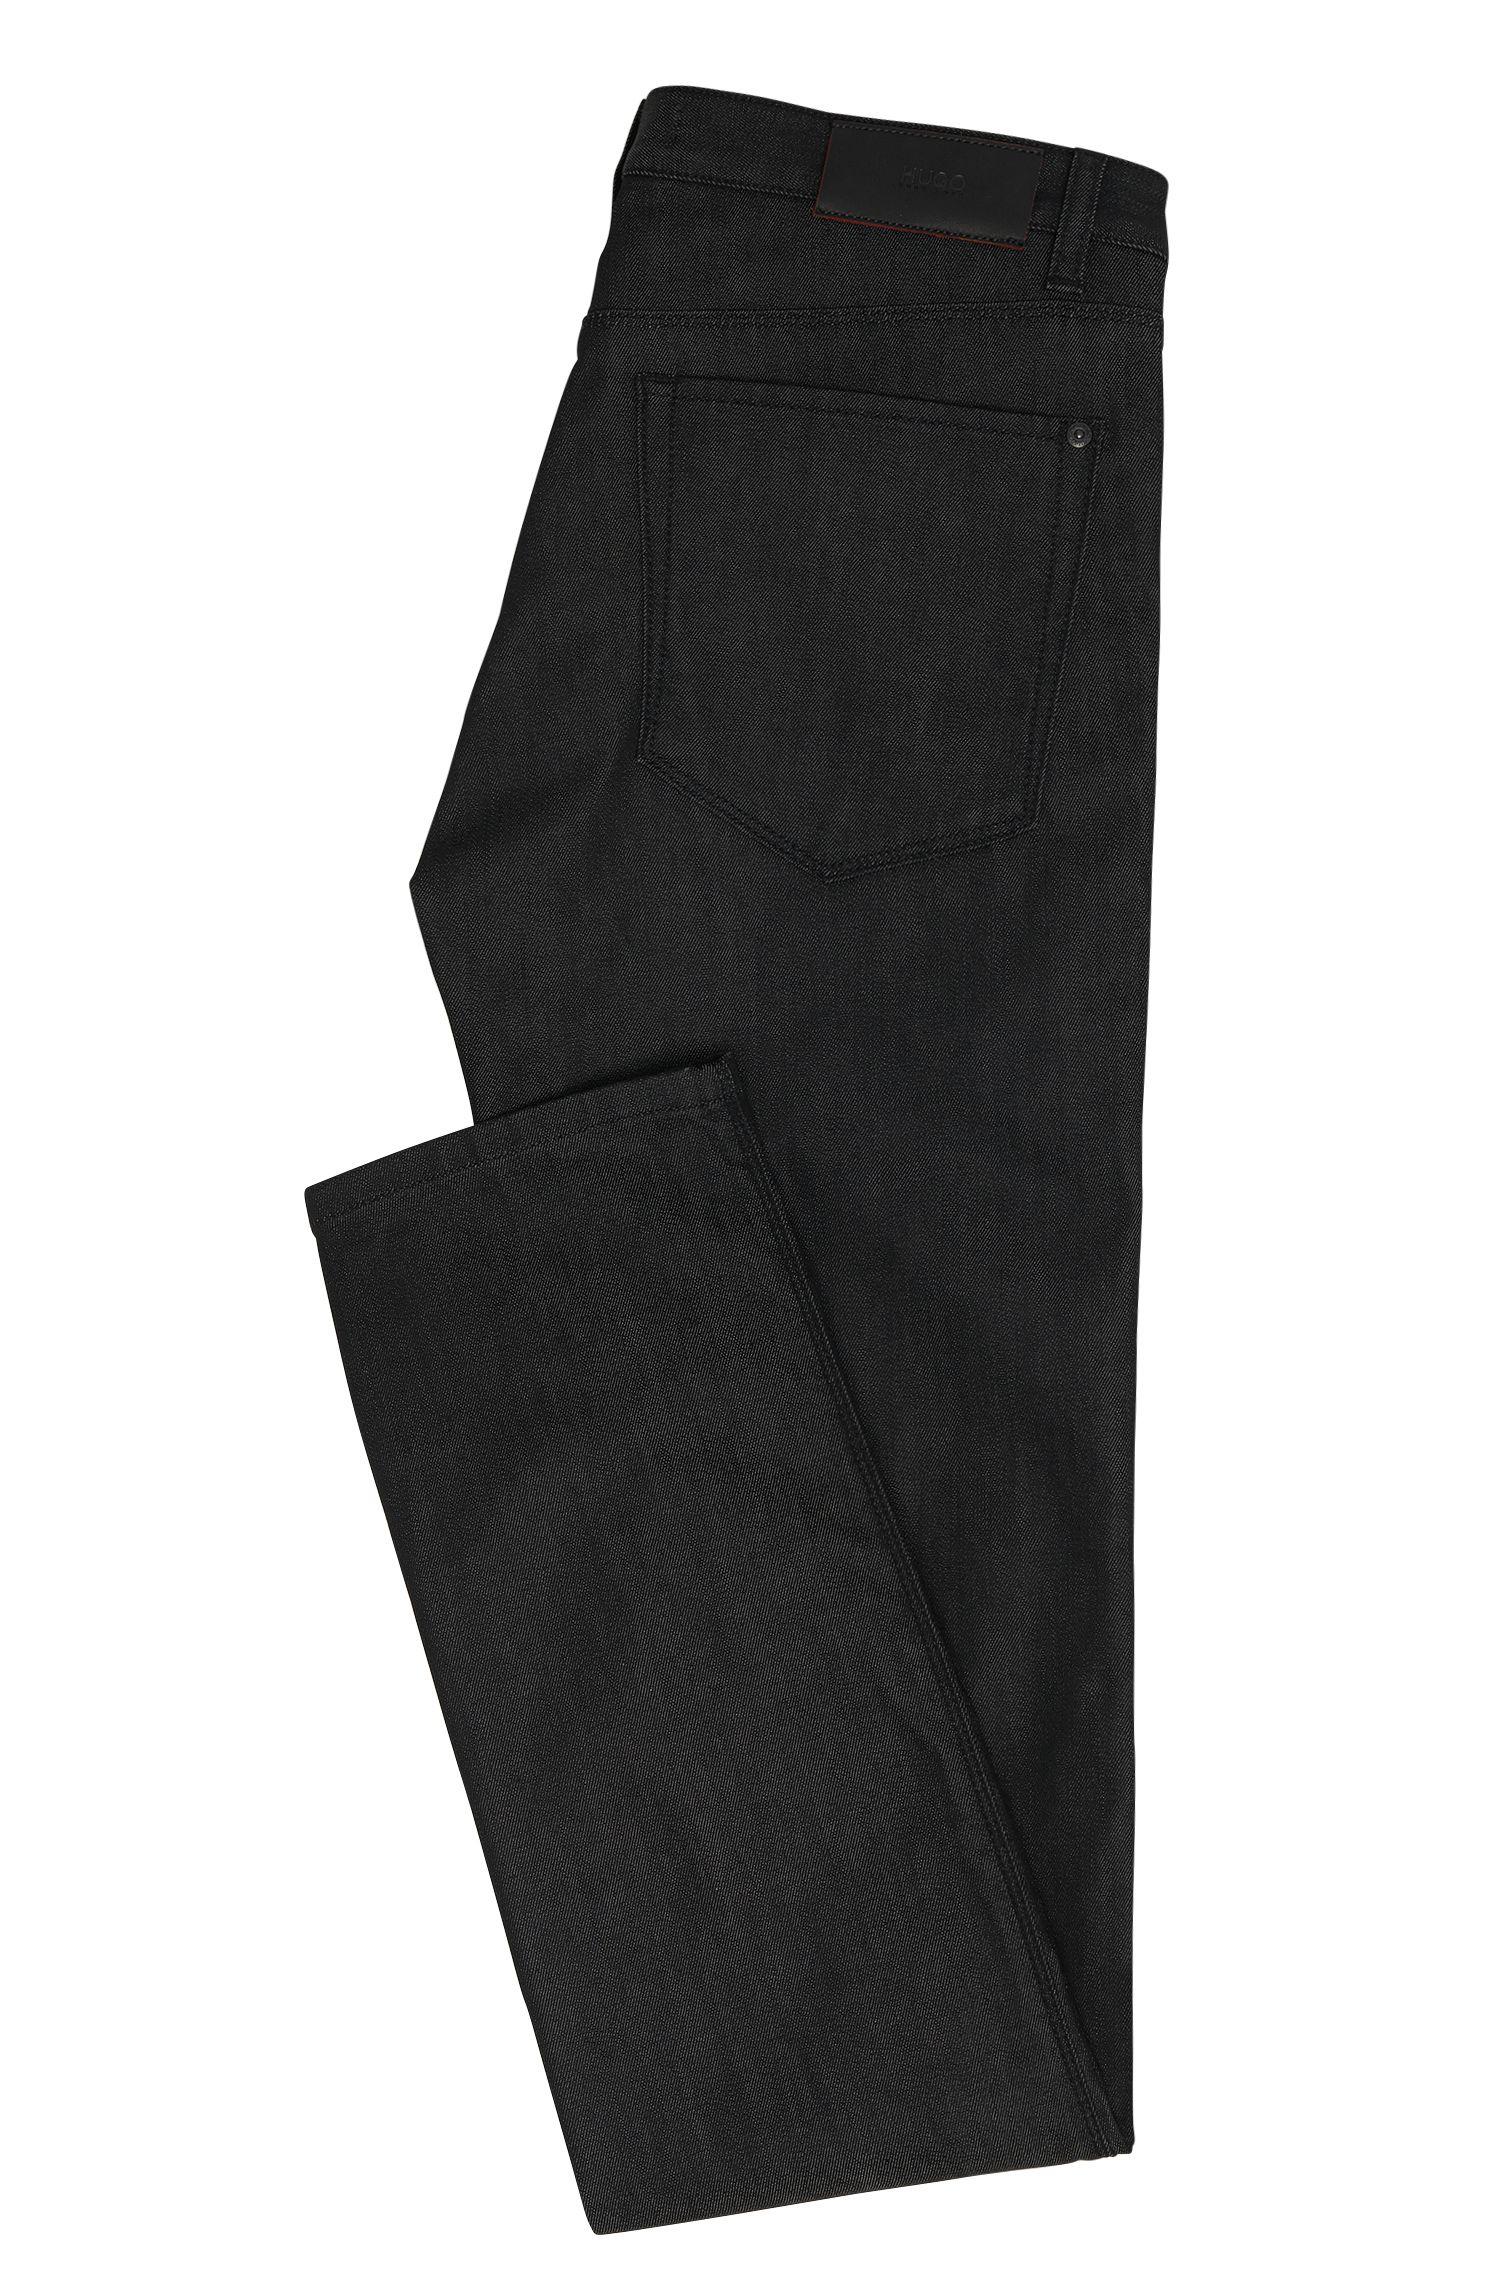 9.5 oz Stretch Cotton Blend Jeans, Slim Fit | Hugo 708